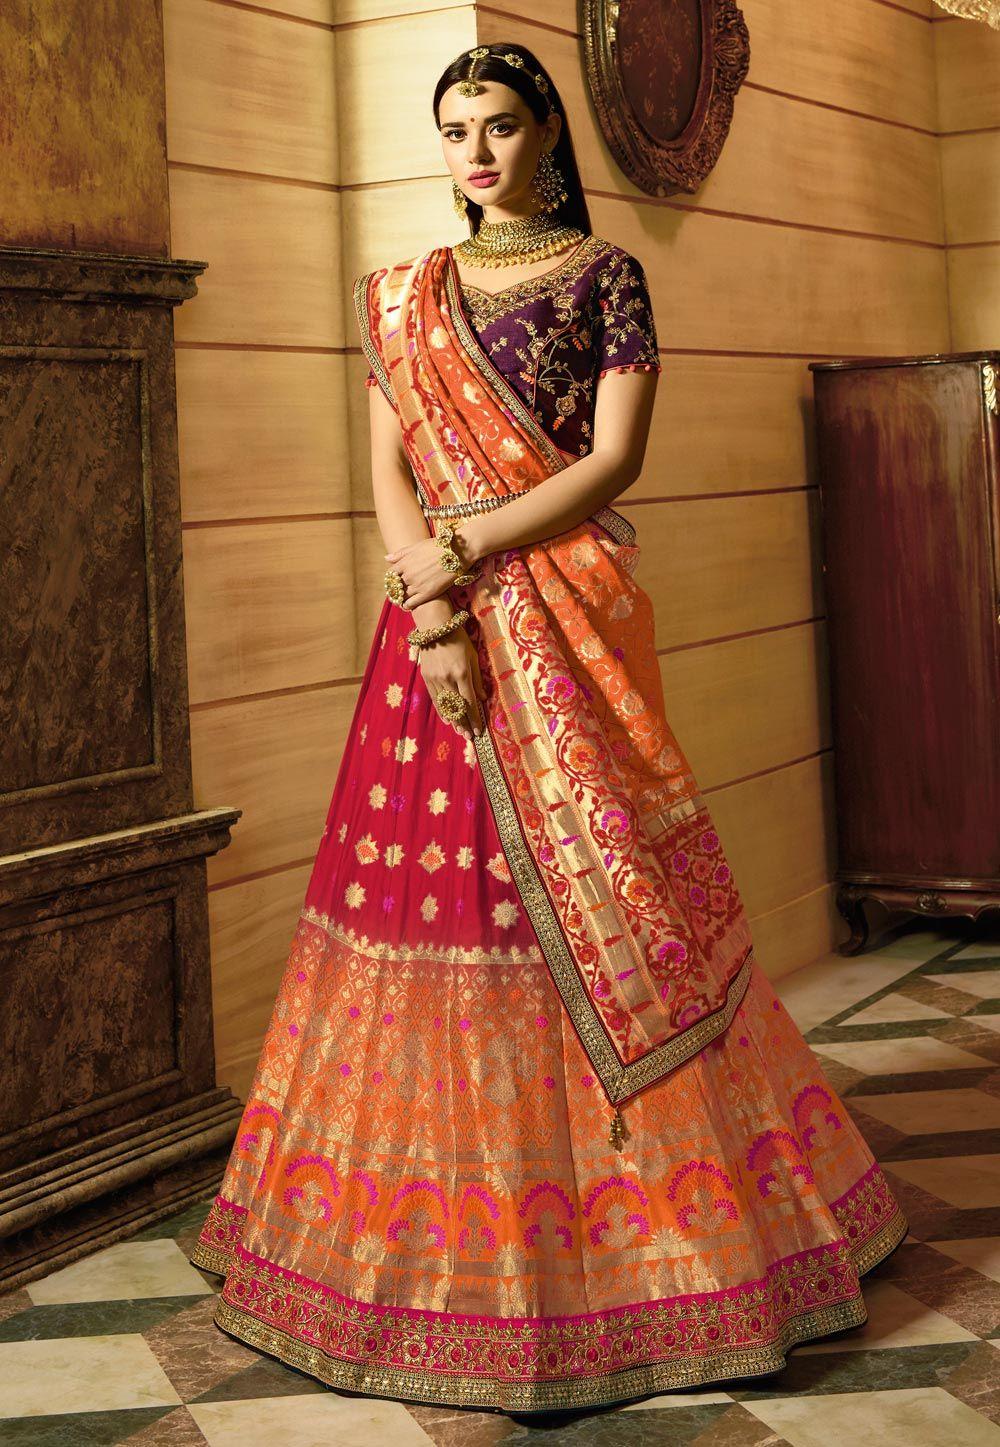 5dff8e328b Buy Orange Banarasi Silk Designer Lehenga Choli 153913 online at best price  from vast collection of Lehenga Choli and Chaniya Choli at  Indianclothstore.com.